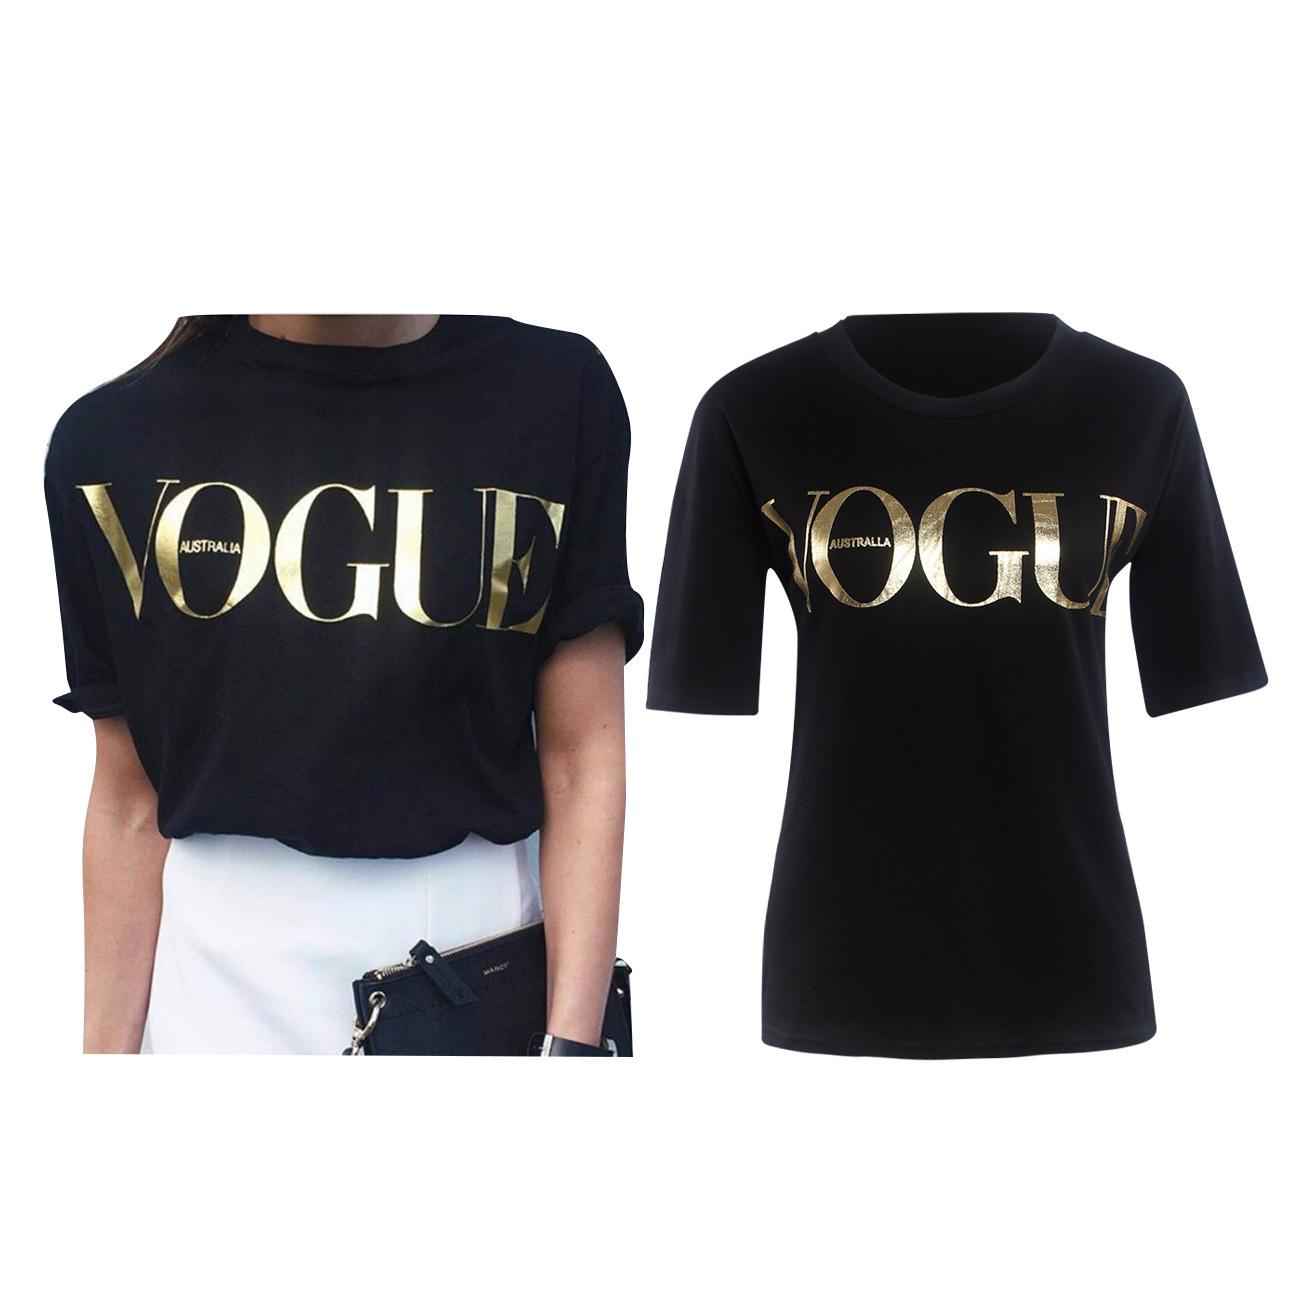 European Tops & Tees Women 2016 T Shirt VOGUE Printed Punk Rock Fashion Graphic Tees Women Designer Clothing T-shirts Tops 8921(China (Mainland))